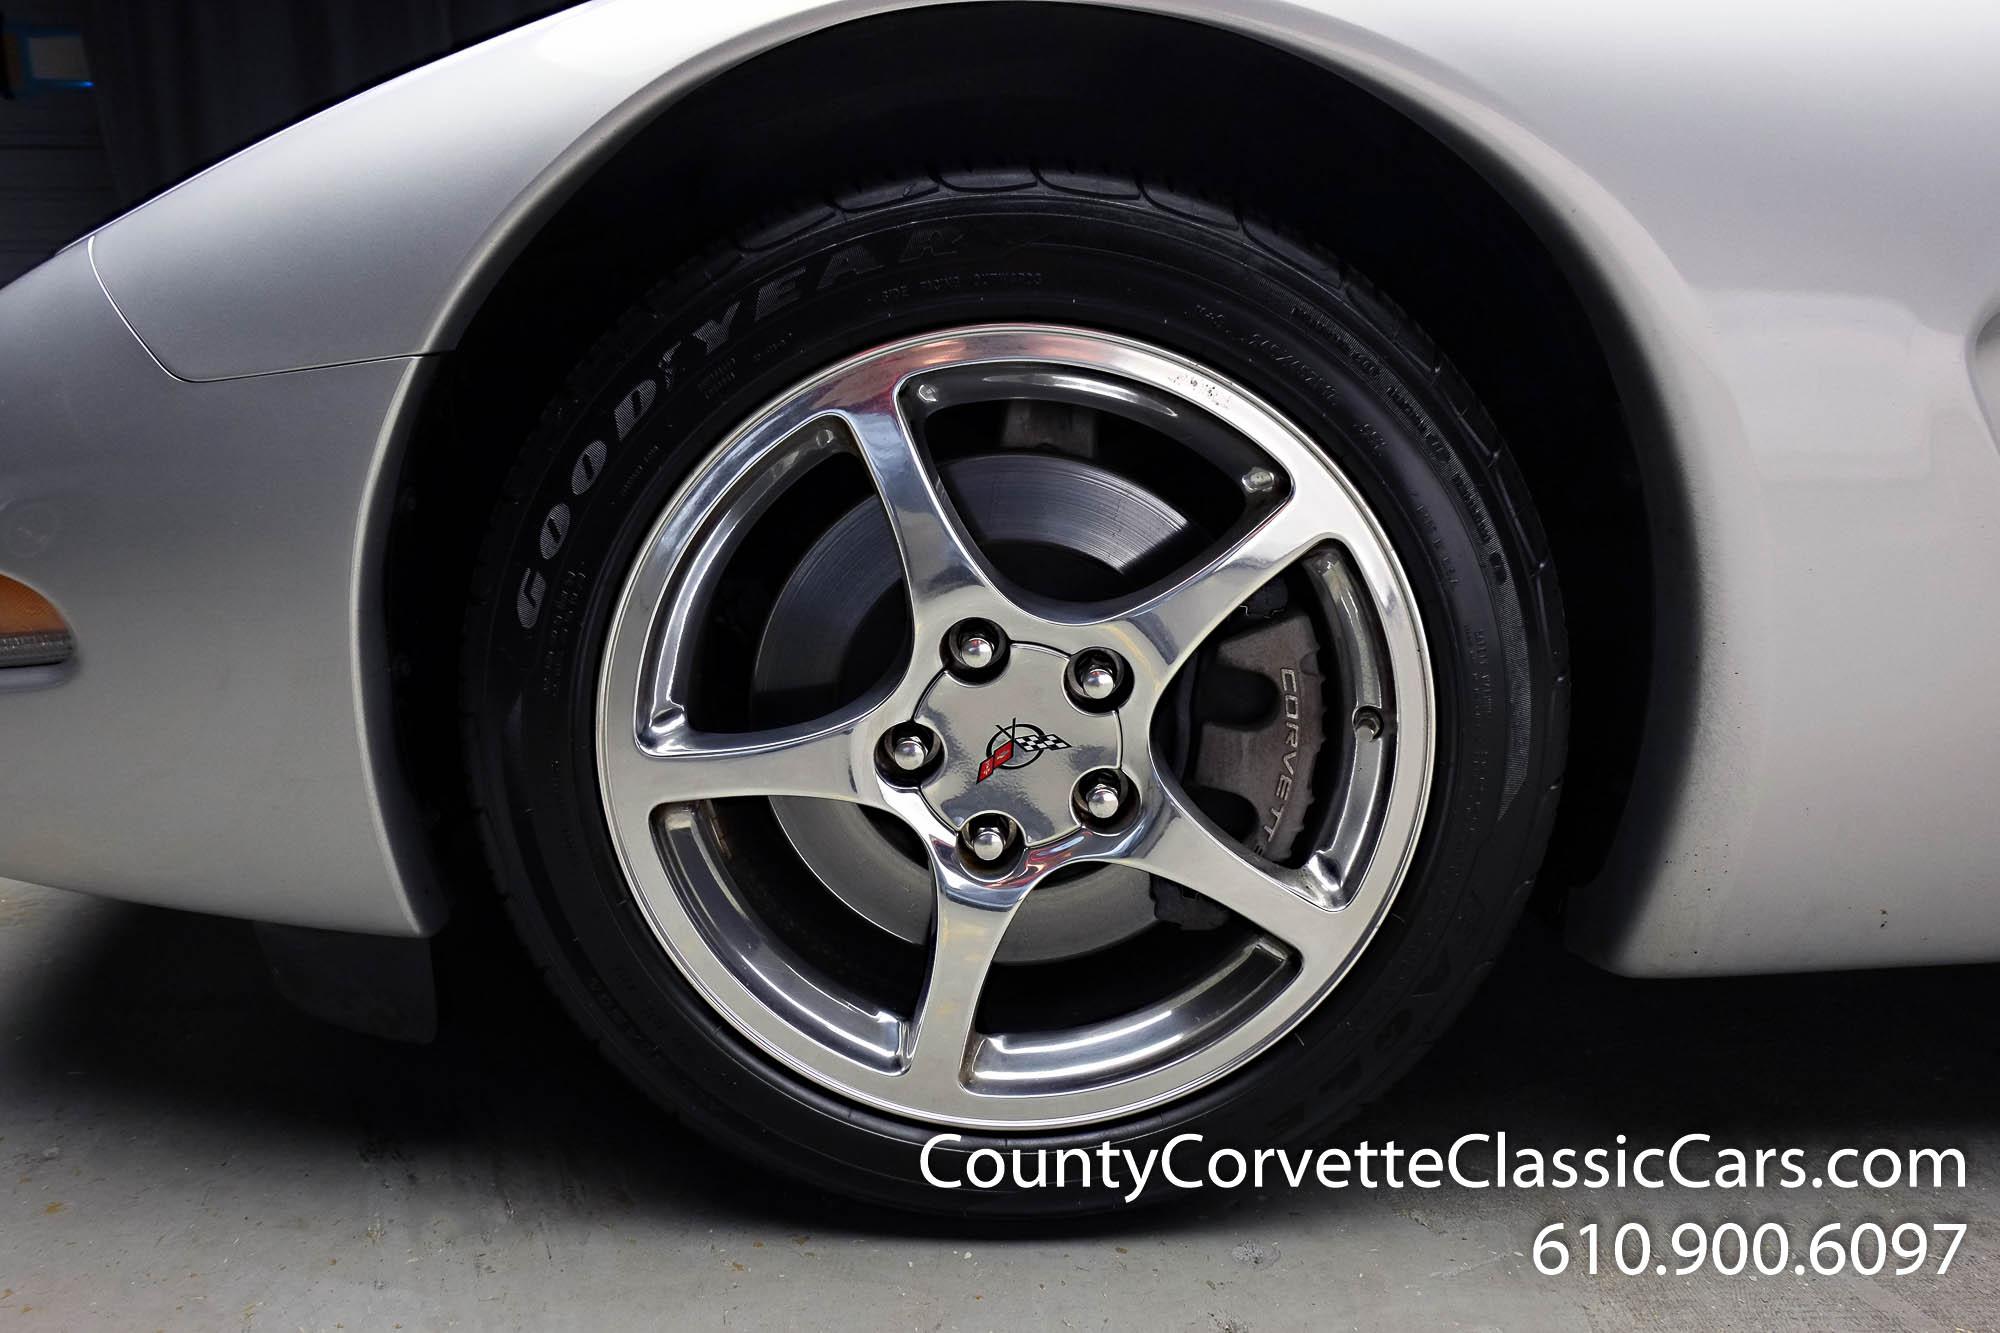 2002-Corvette-Coupe-6.jpg